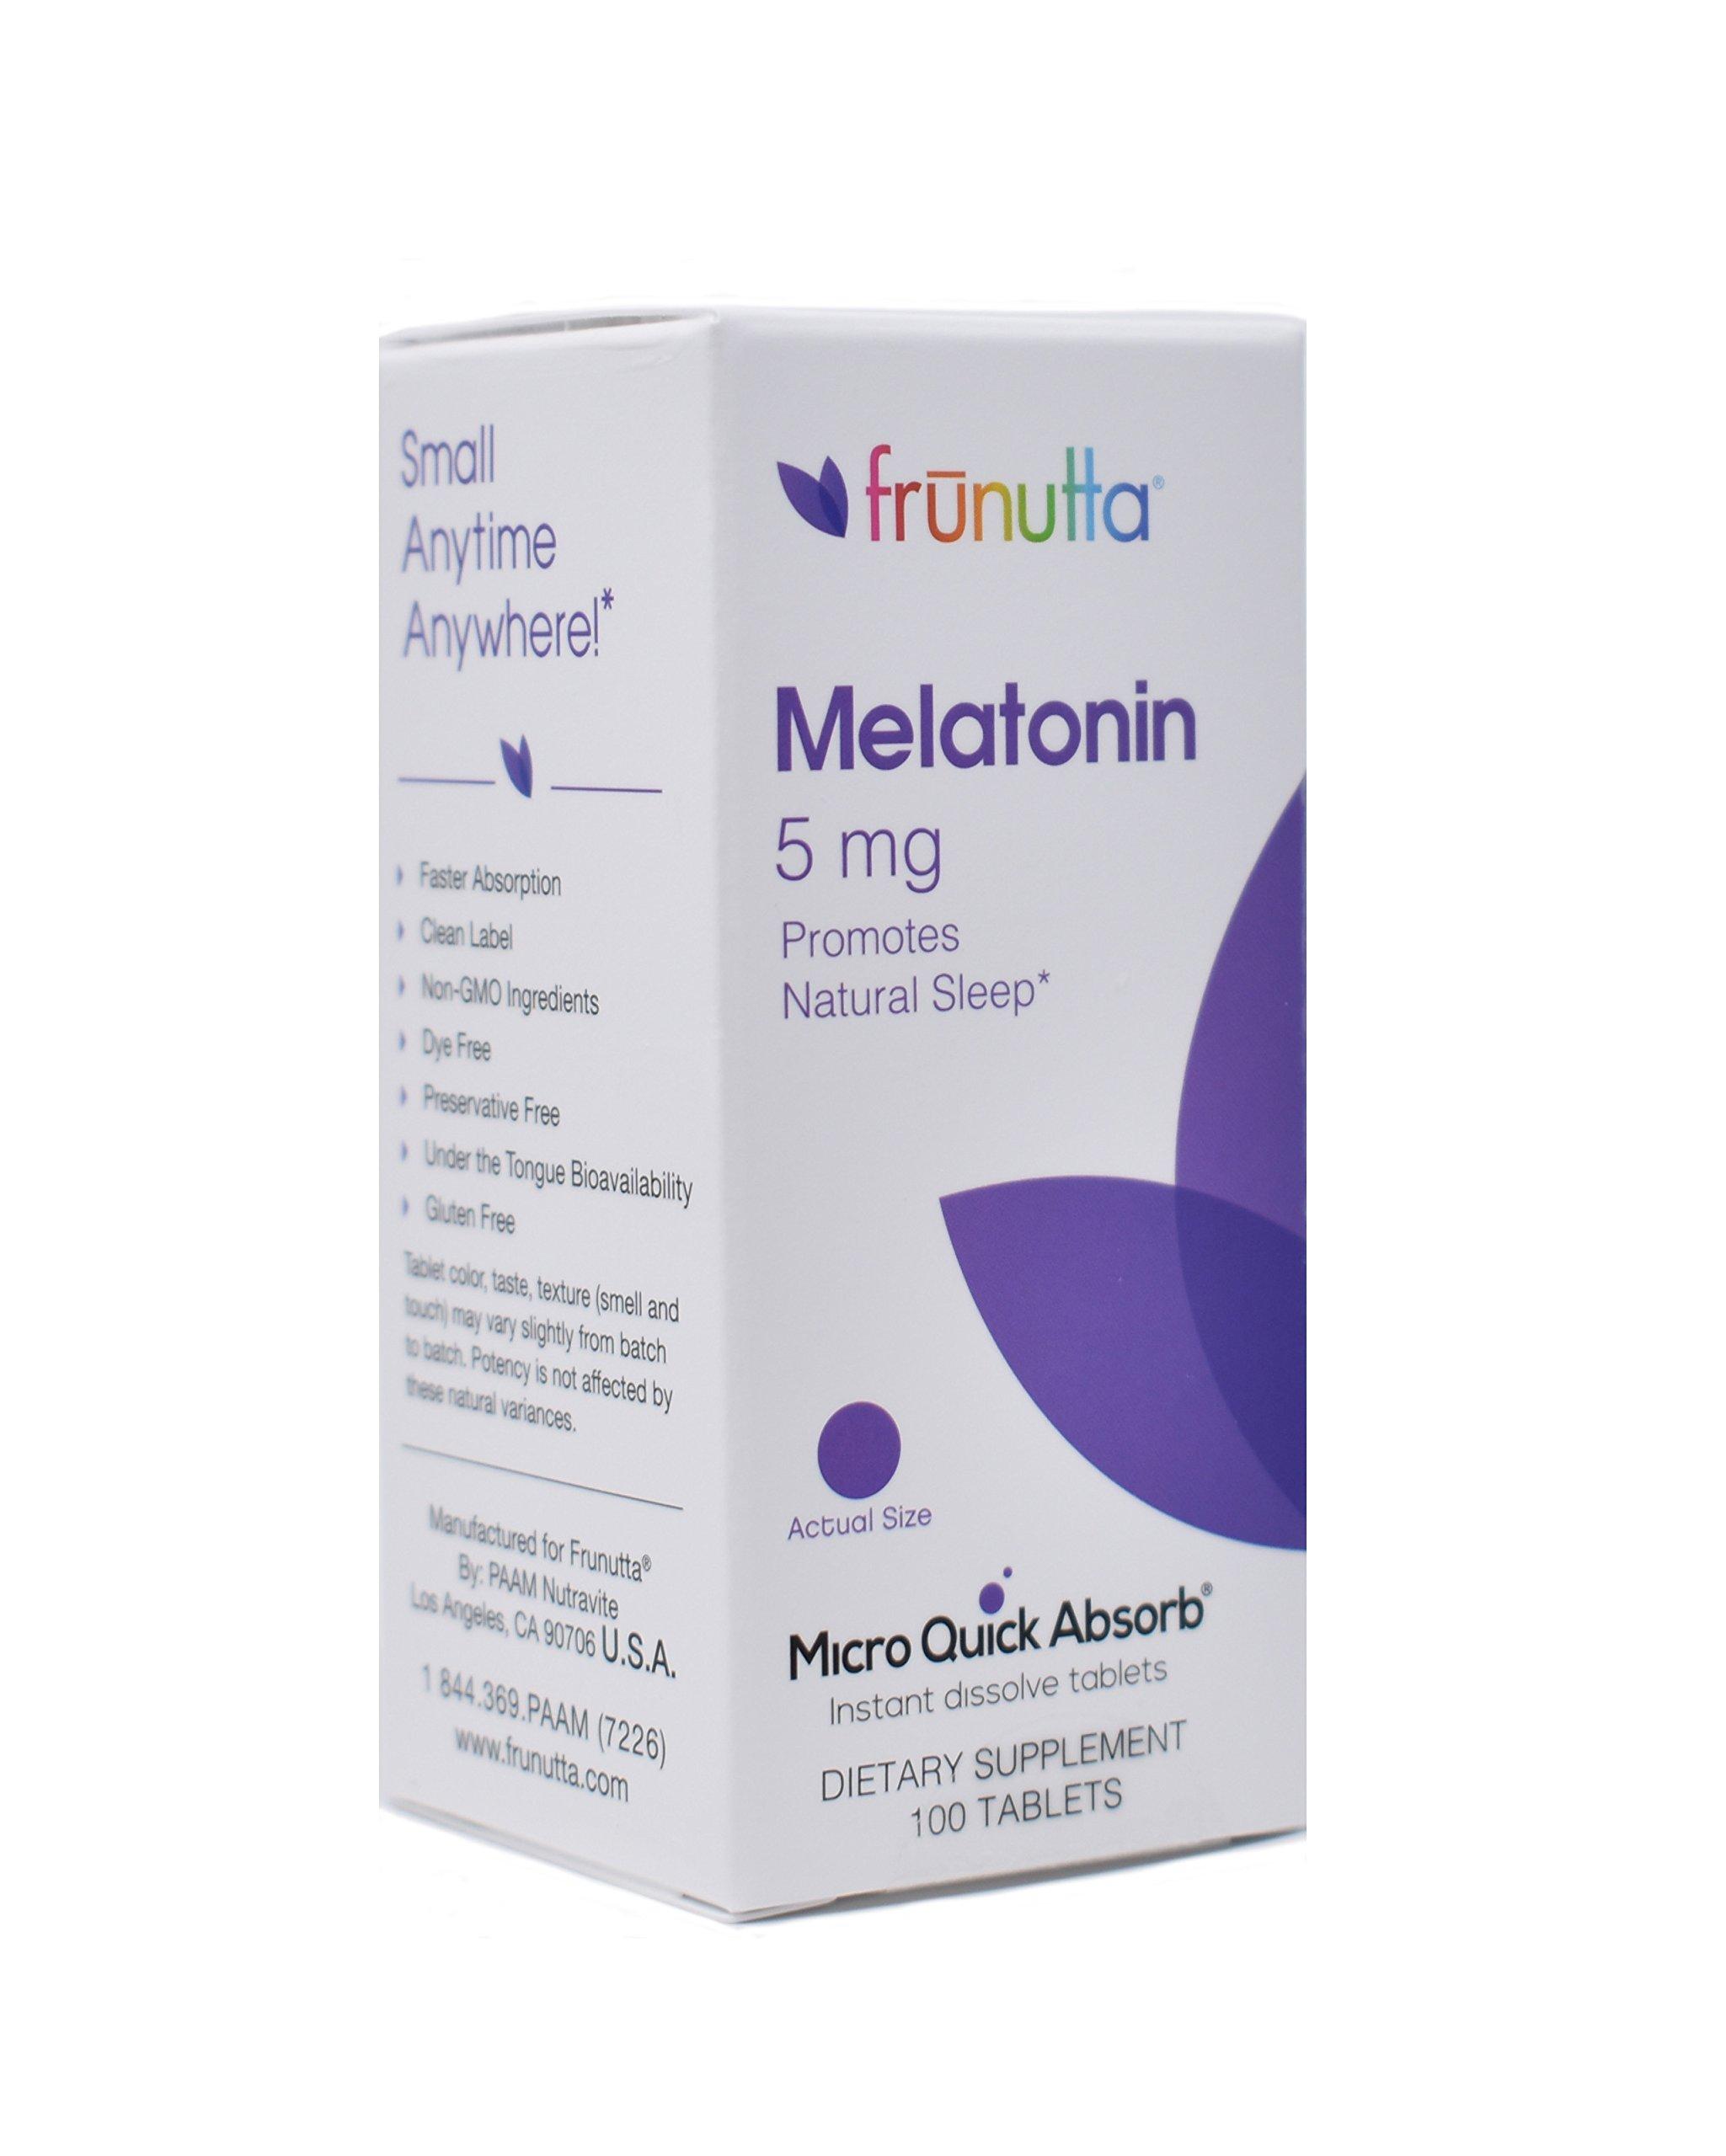 Frunutta Melatonin Under the Tongue Sublingual Tablets - Melatonin 5 mg Micro Quick Absorb Instant Dissolve Tablets Sleep Aid-3 Month Supply